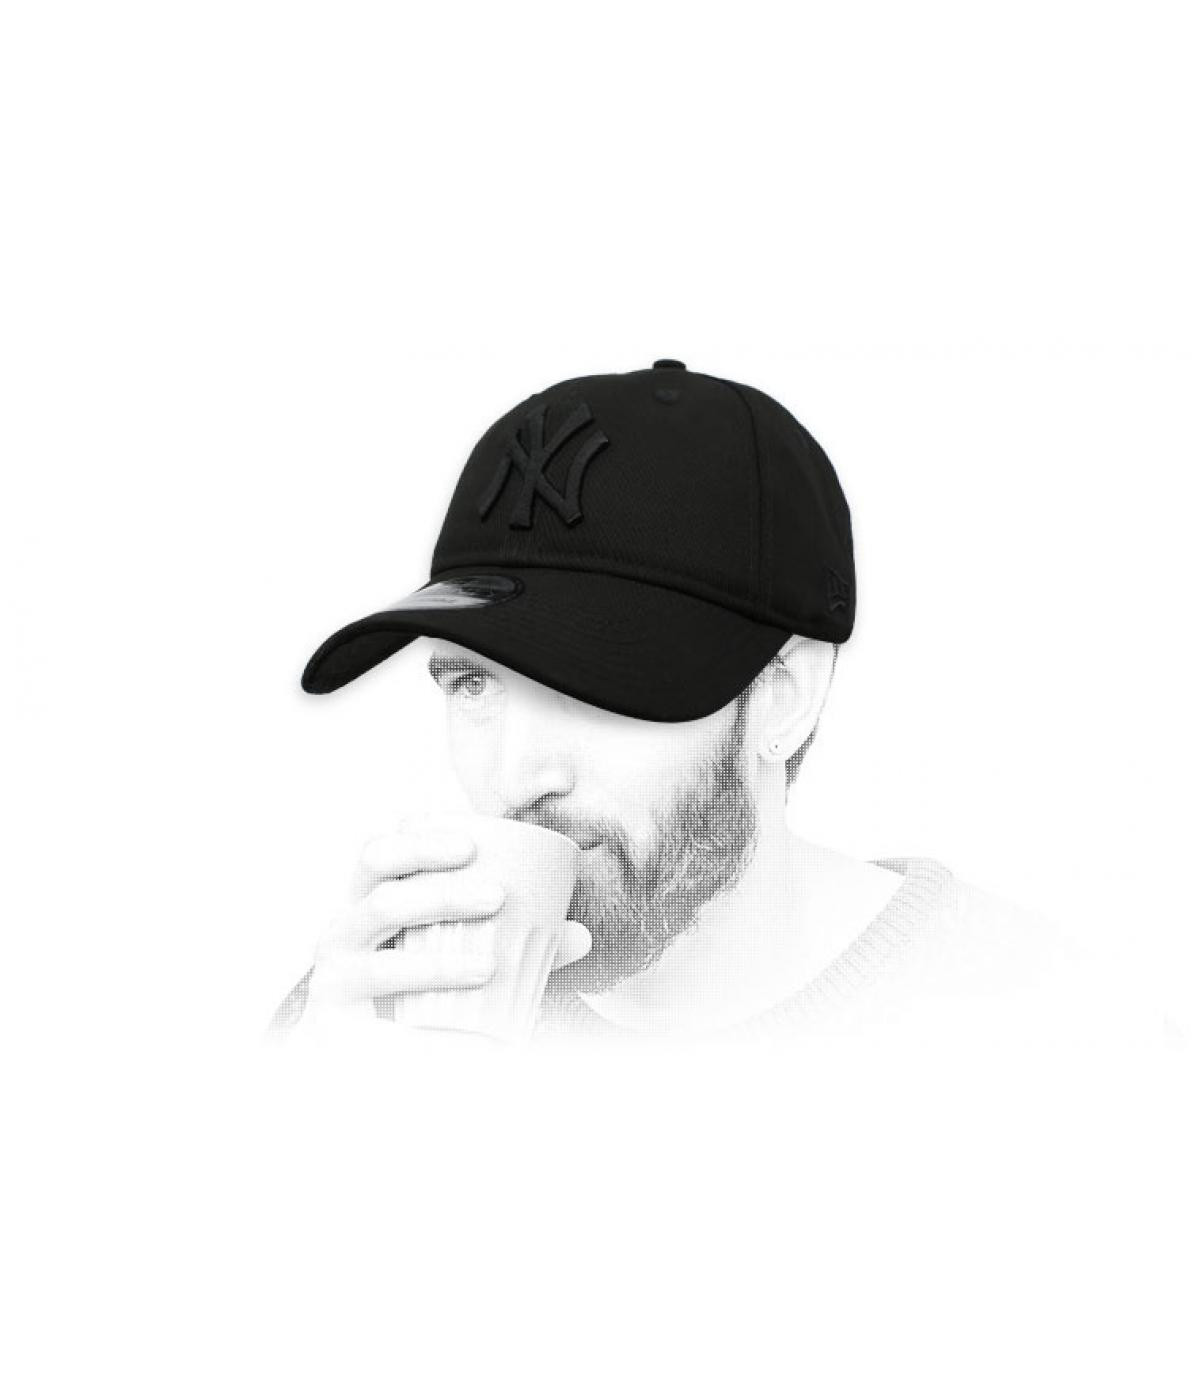 Cap NY schwarz faltbar